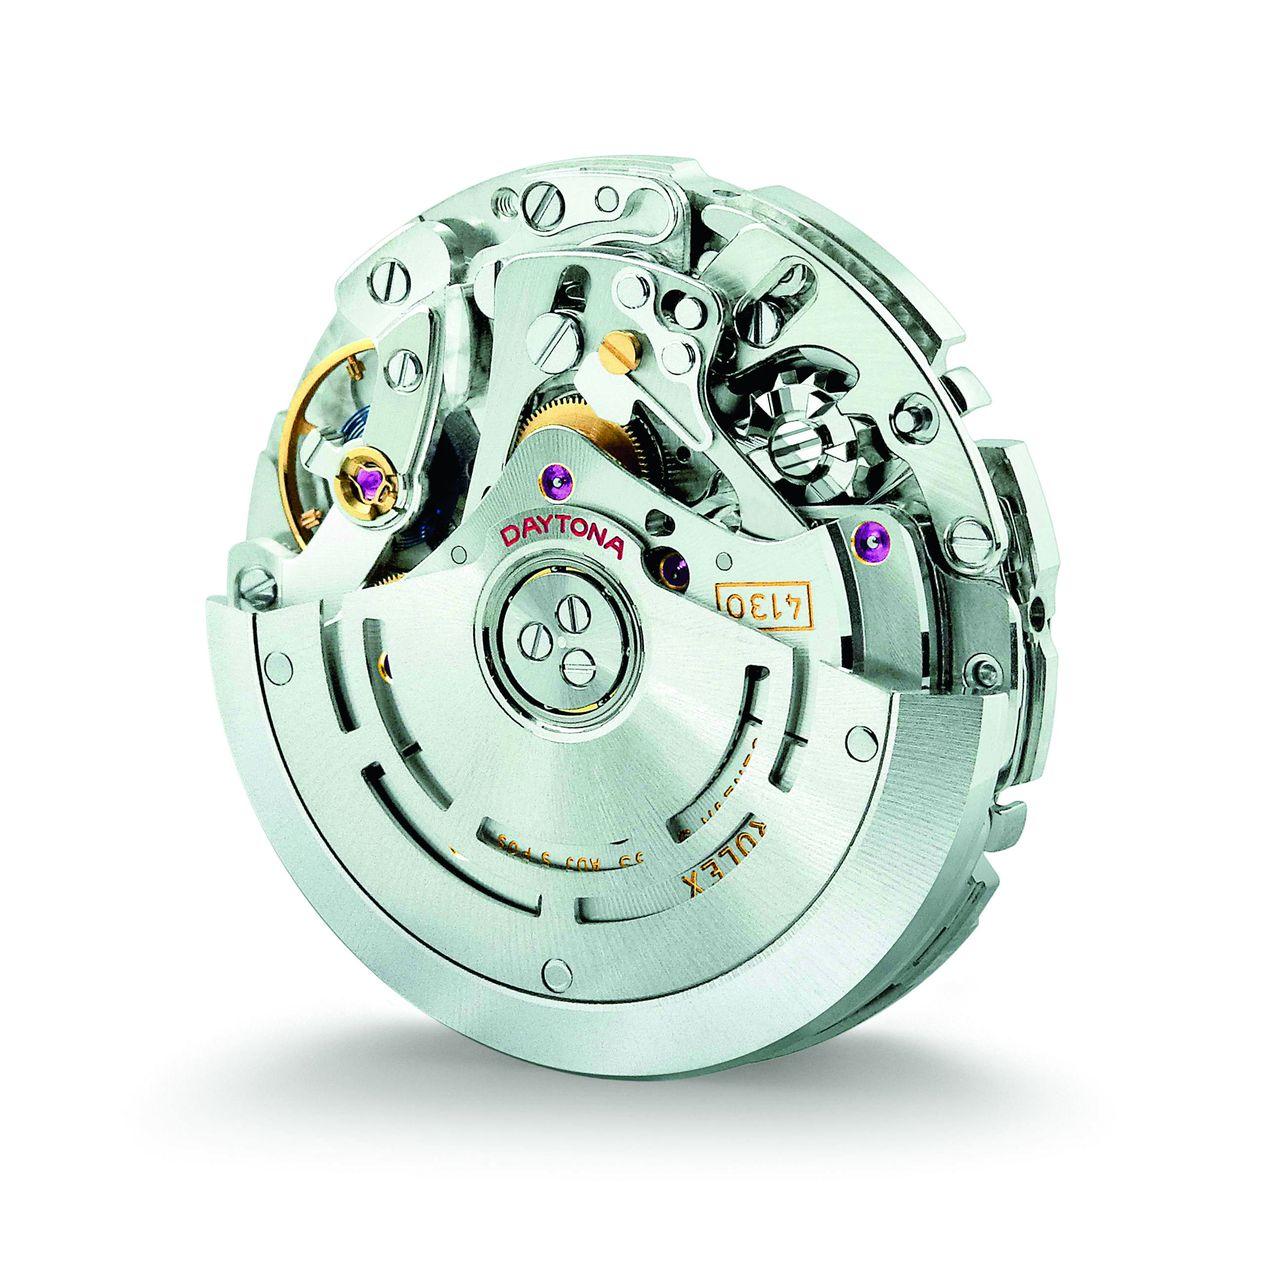 Rolex Calibre 4130